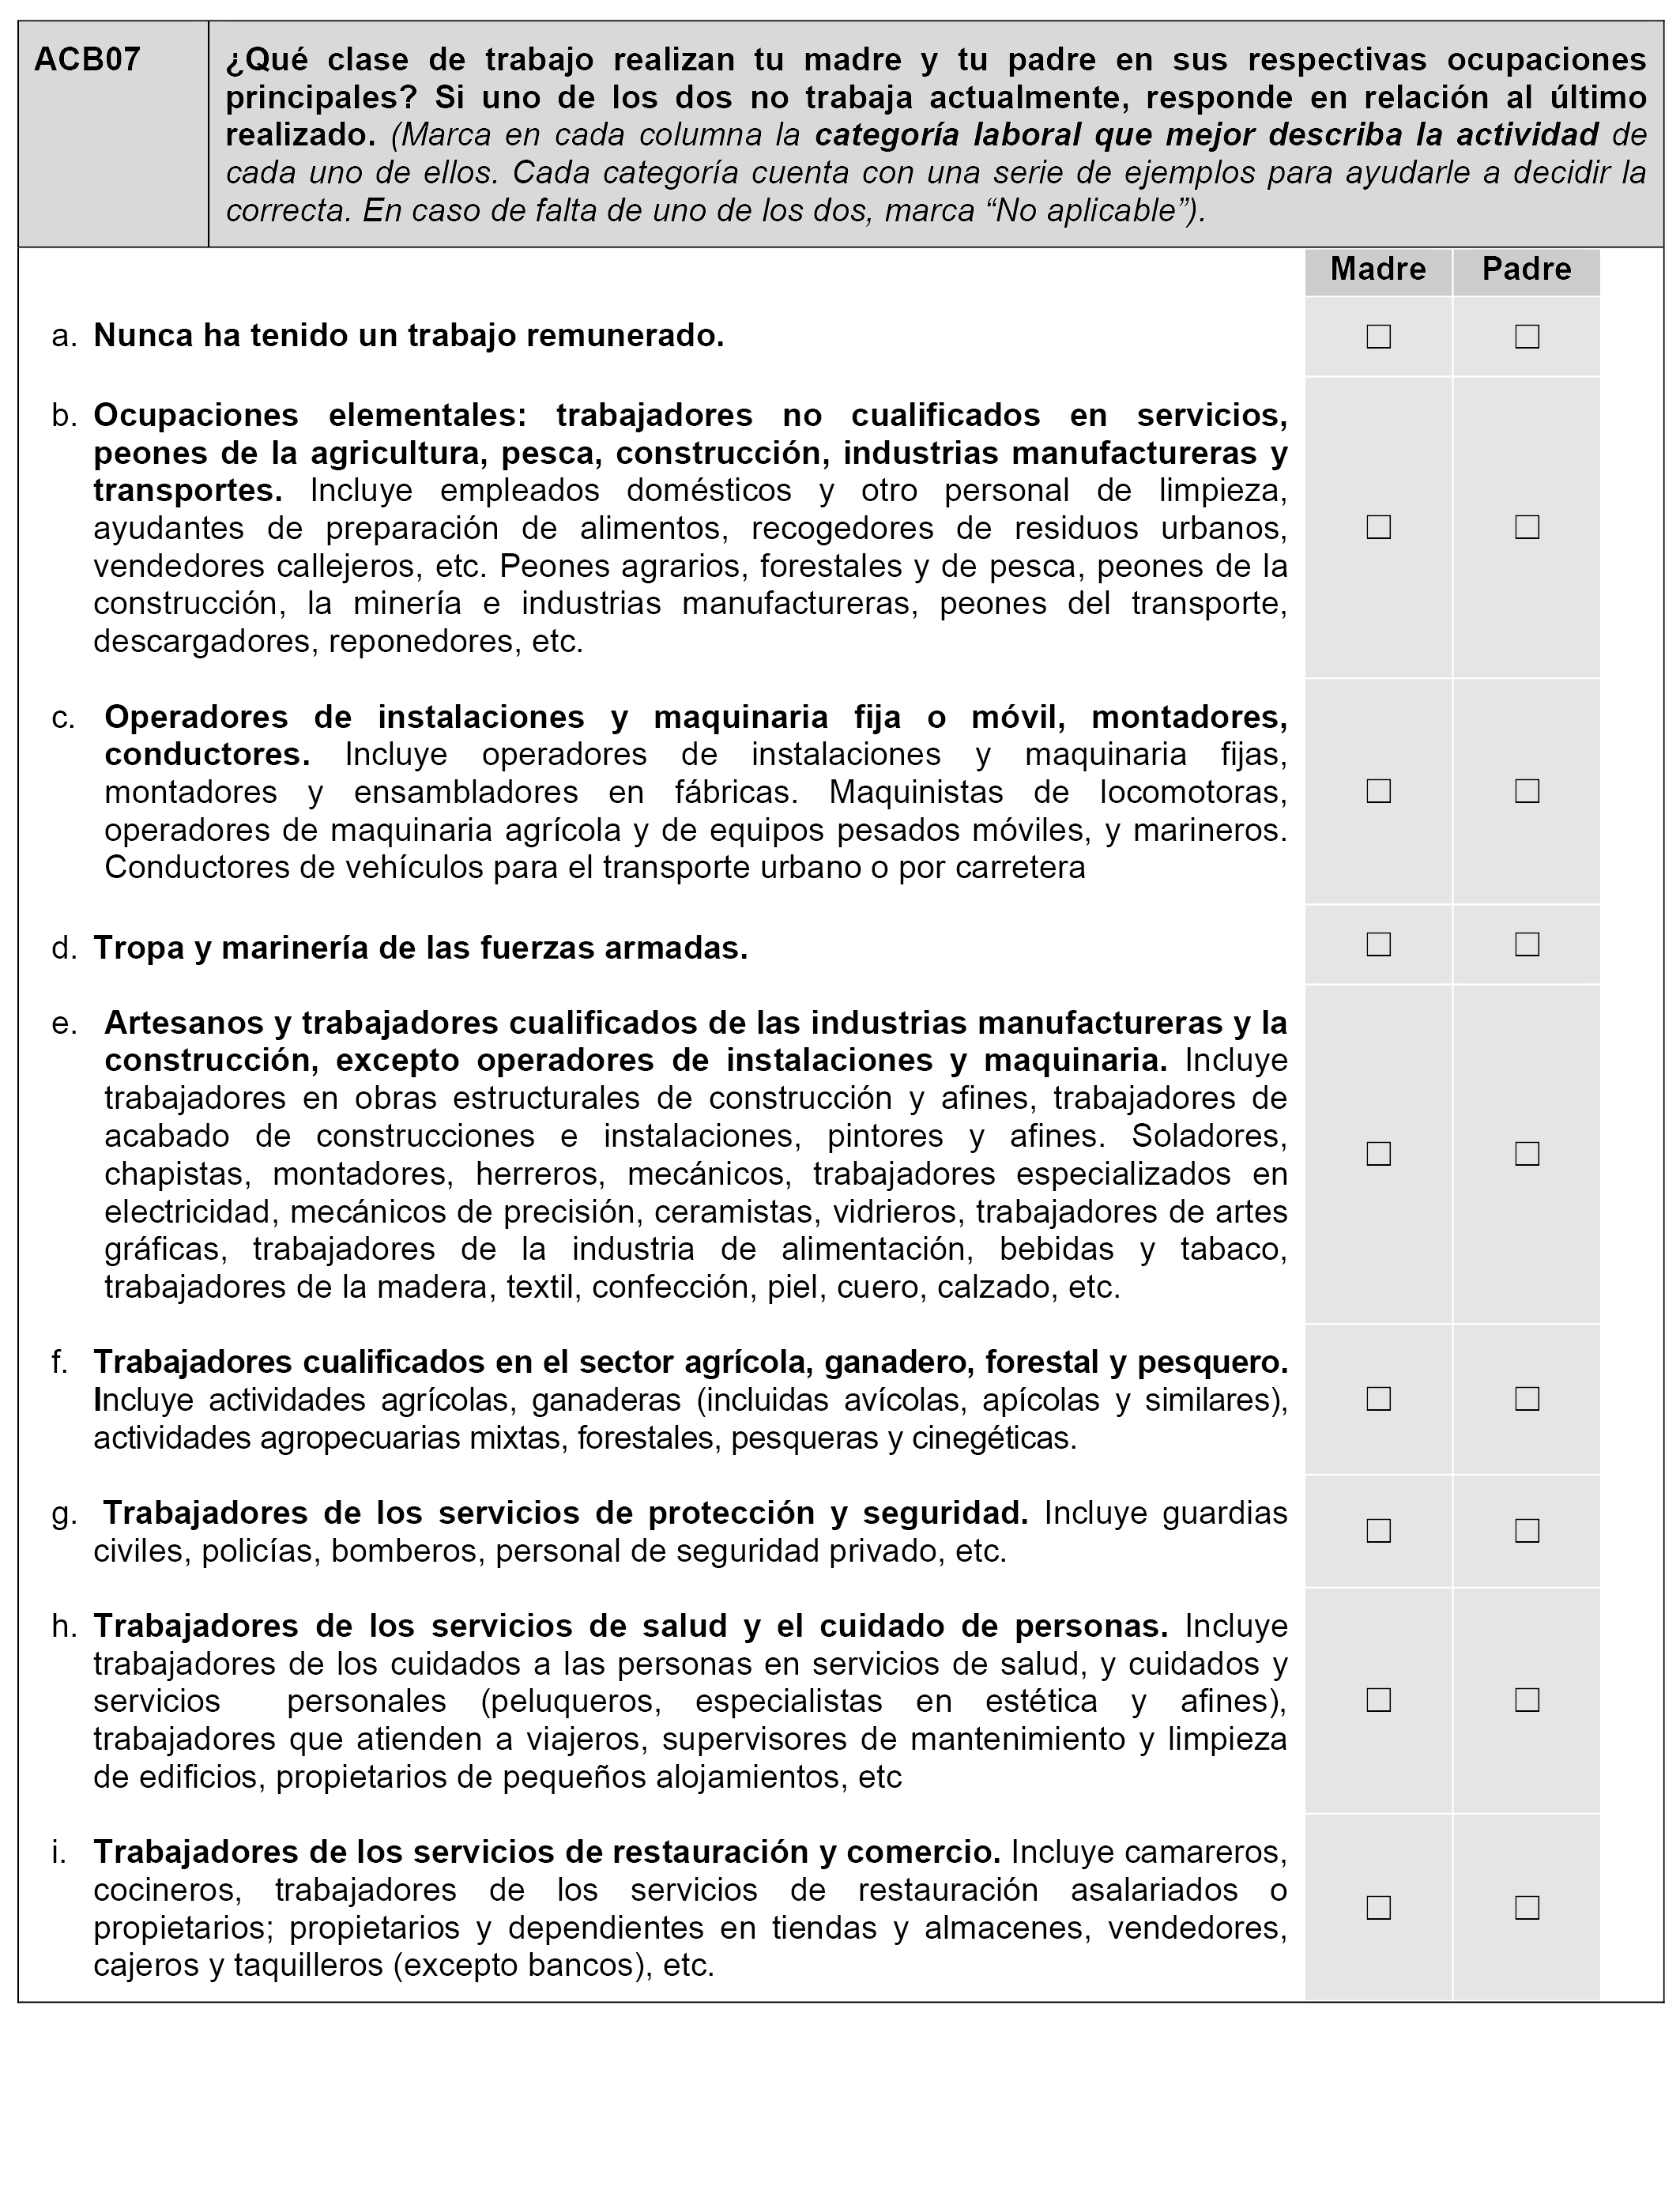 BOE.es - Documento BOE-A-2018-984